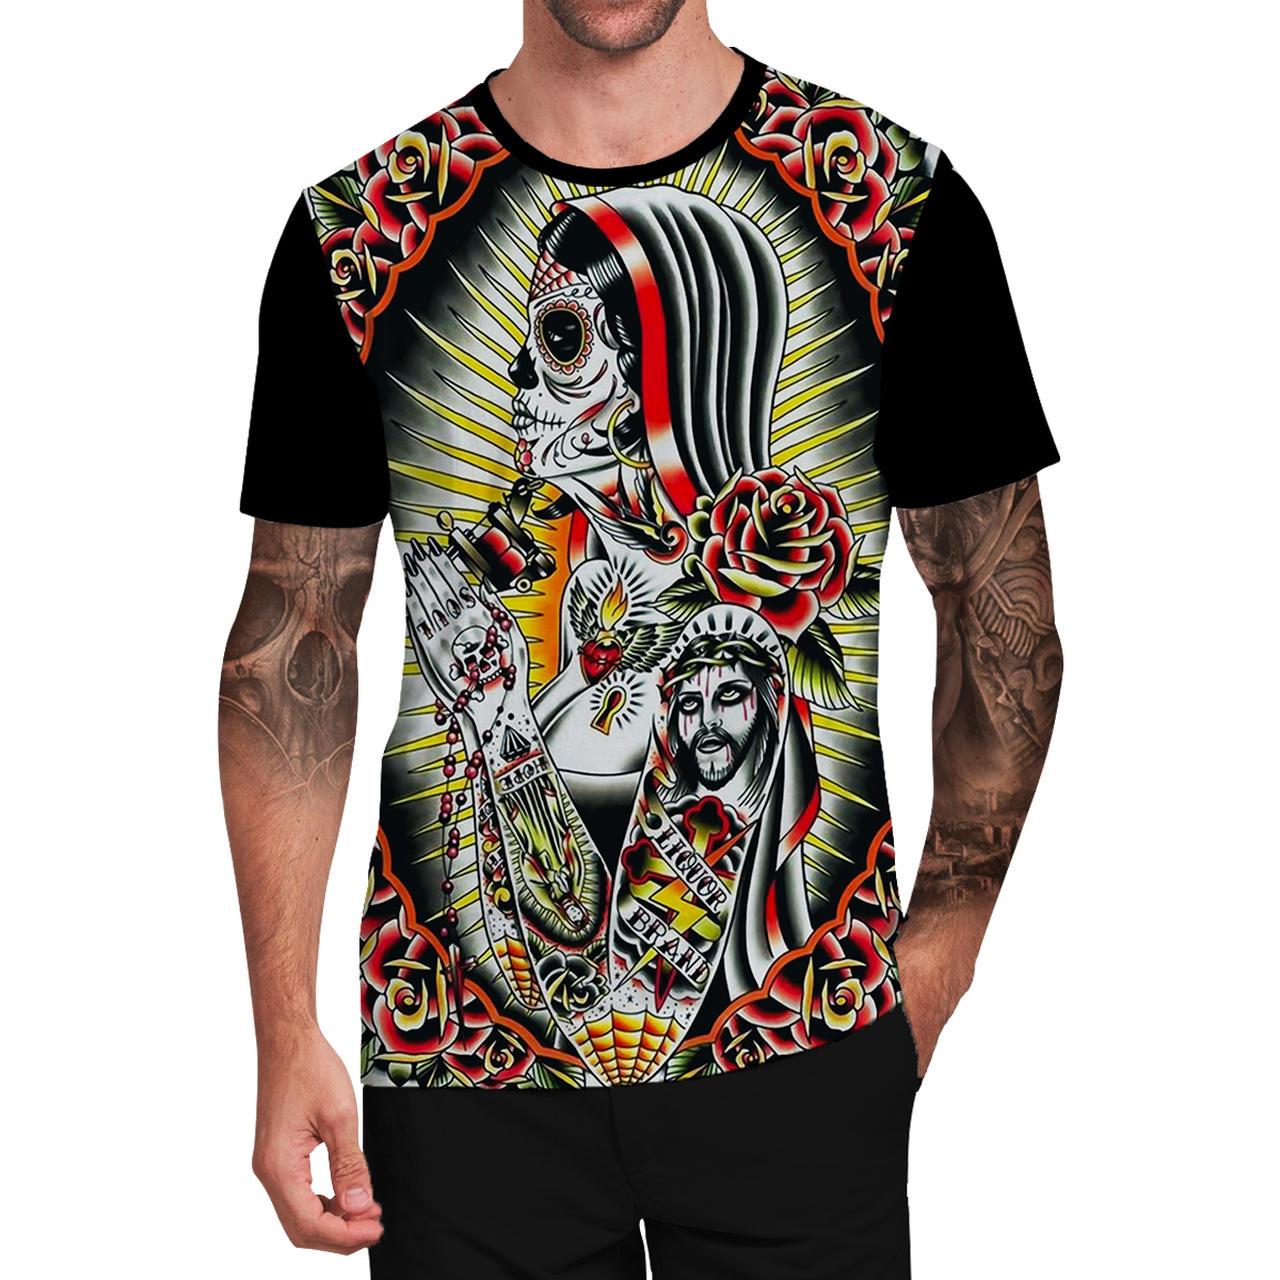 Stompy Camiseta Tattoo Tatuagem Caveira Skull 110